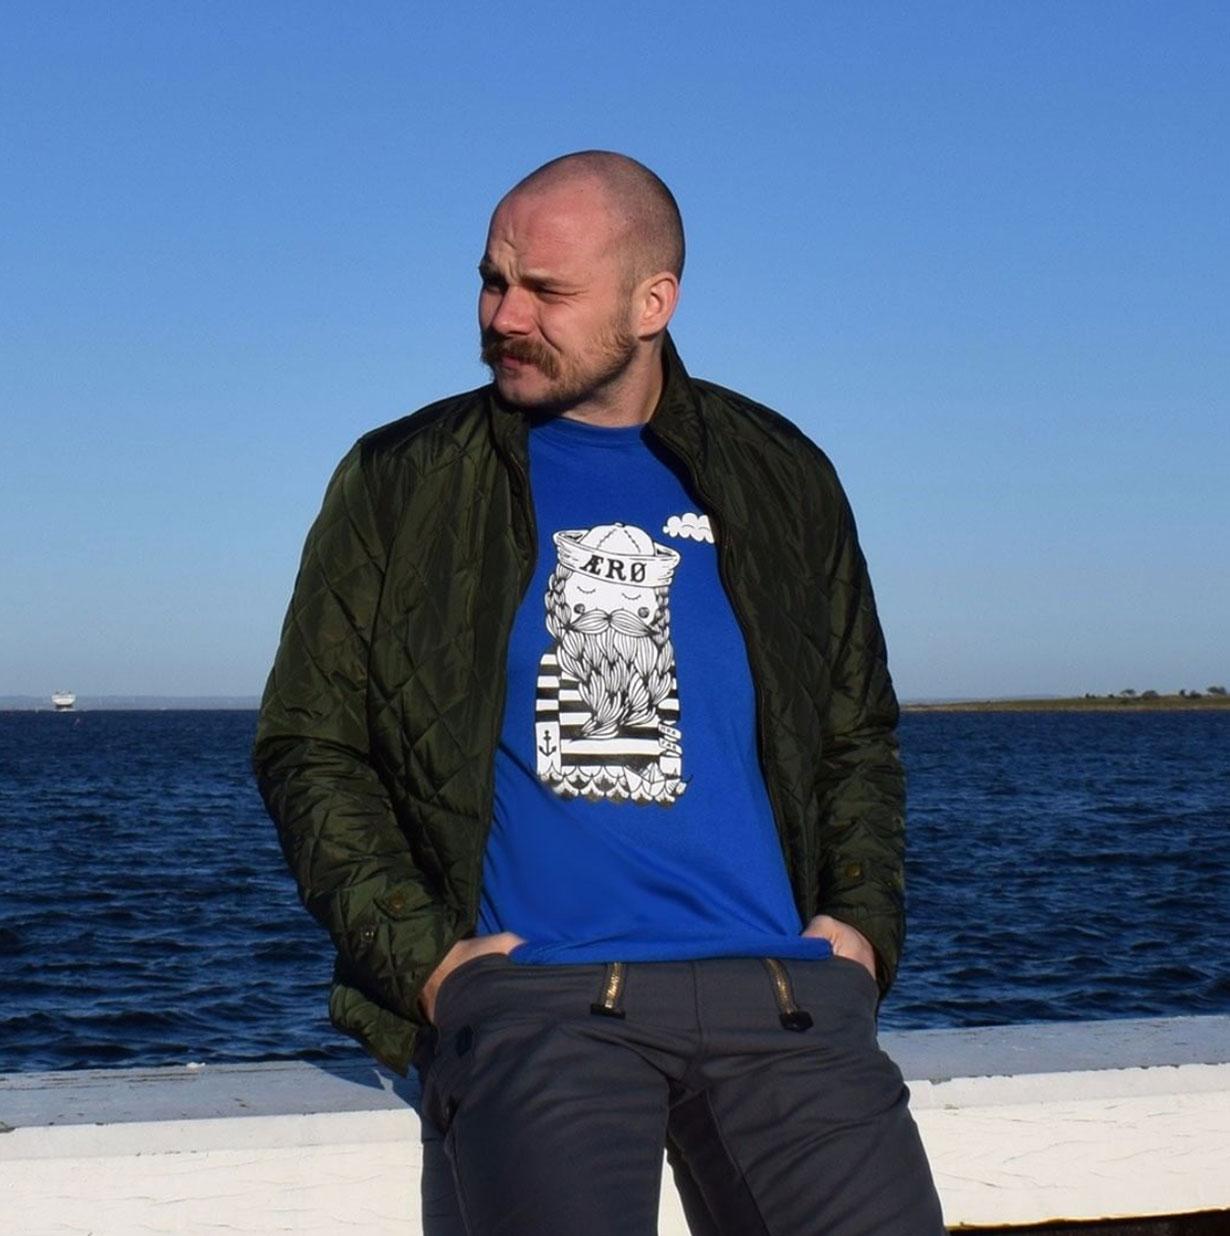 Det Gamle Værft - Ærø t-shirts - namesEARLE, det gamle vaerft, aeroe, cool, menswear, aeroe